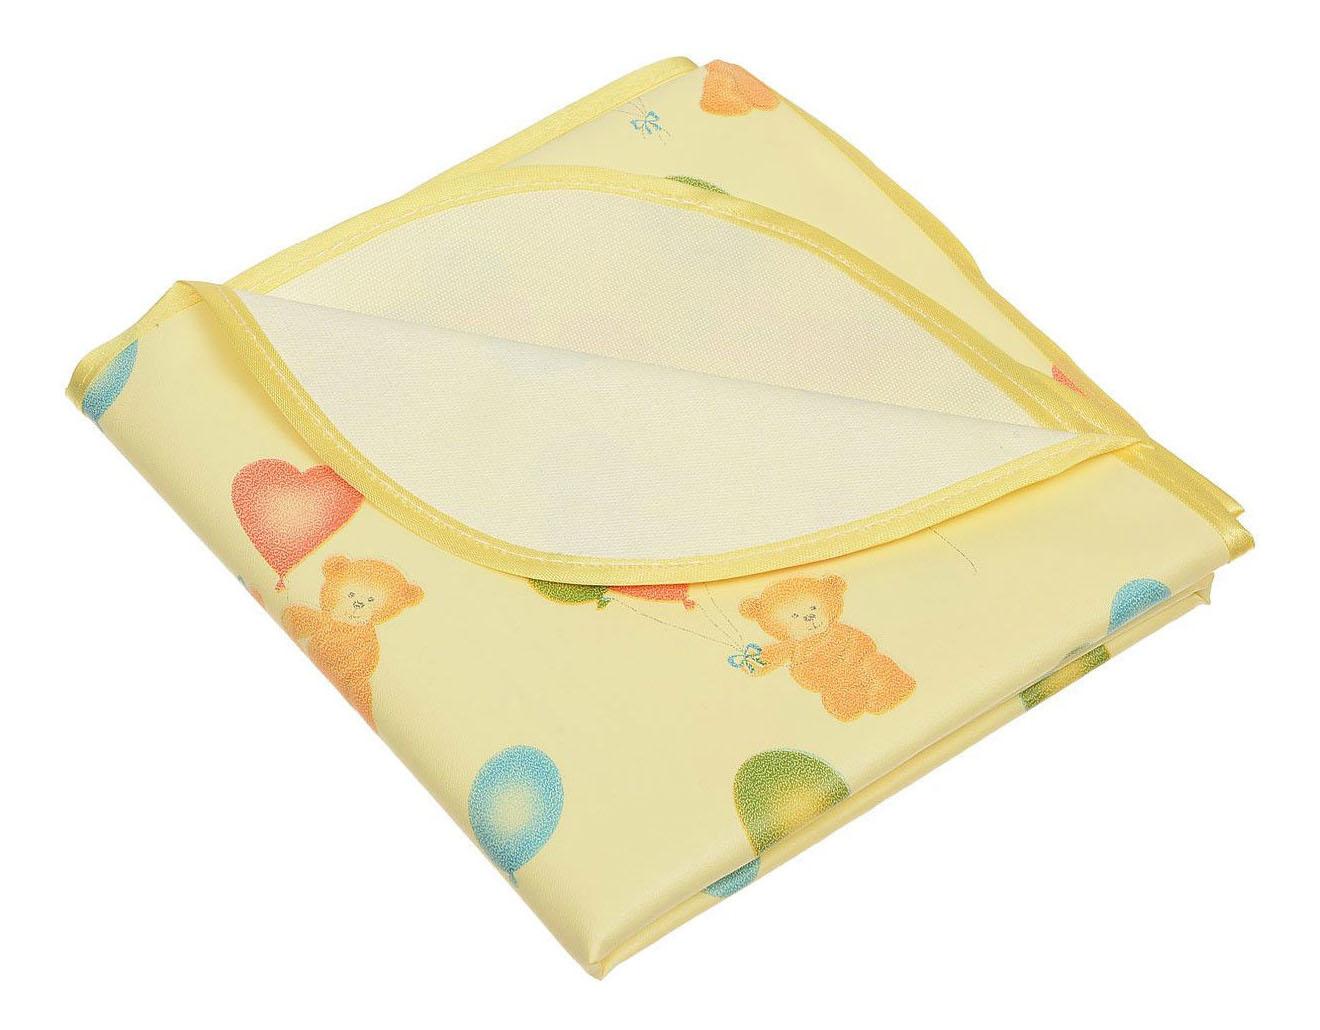 Клеенка Колорит с окантовкой Мишки, цв. желтый, 0,5 х 0,7 м фото